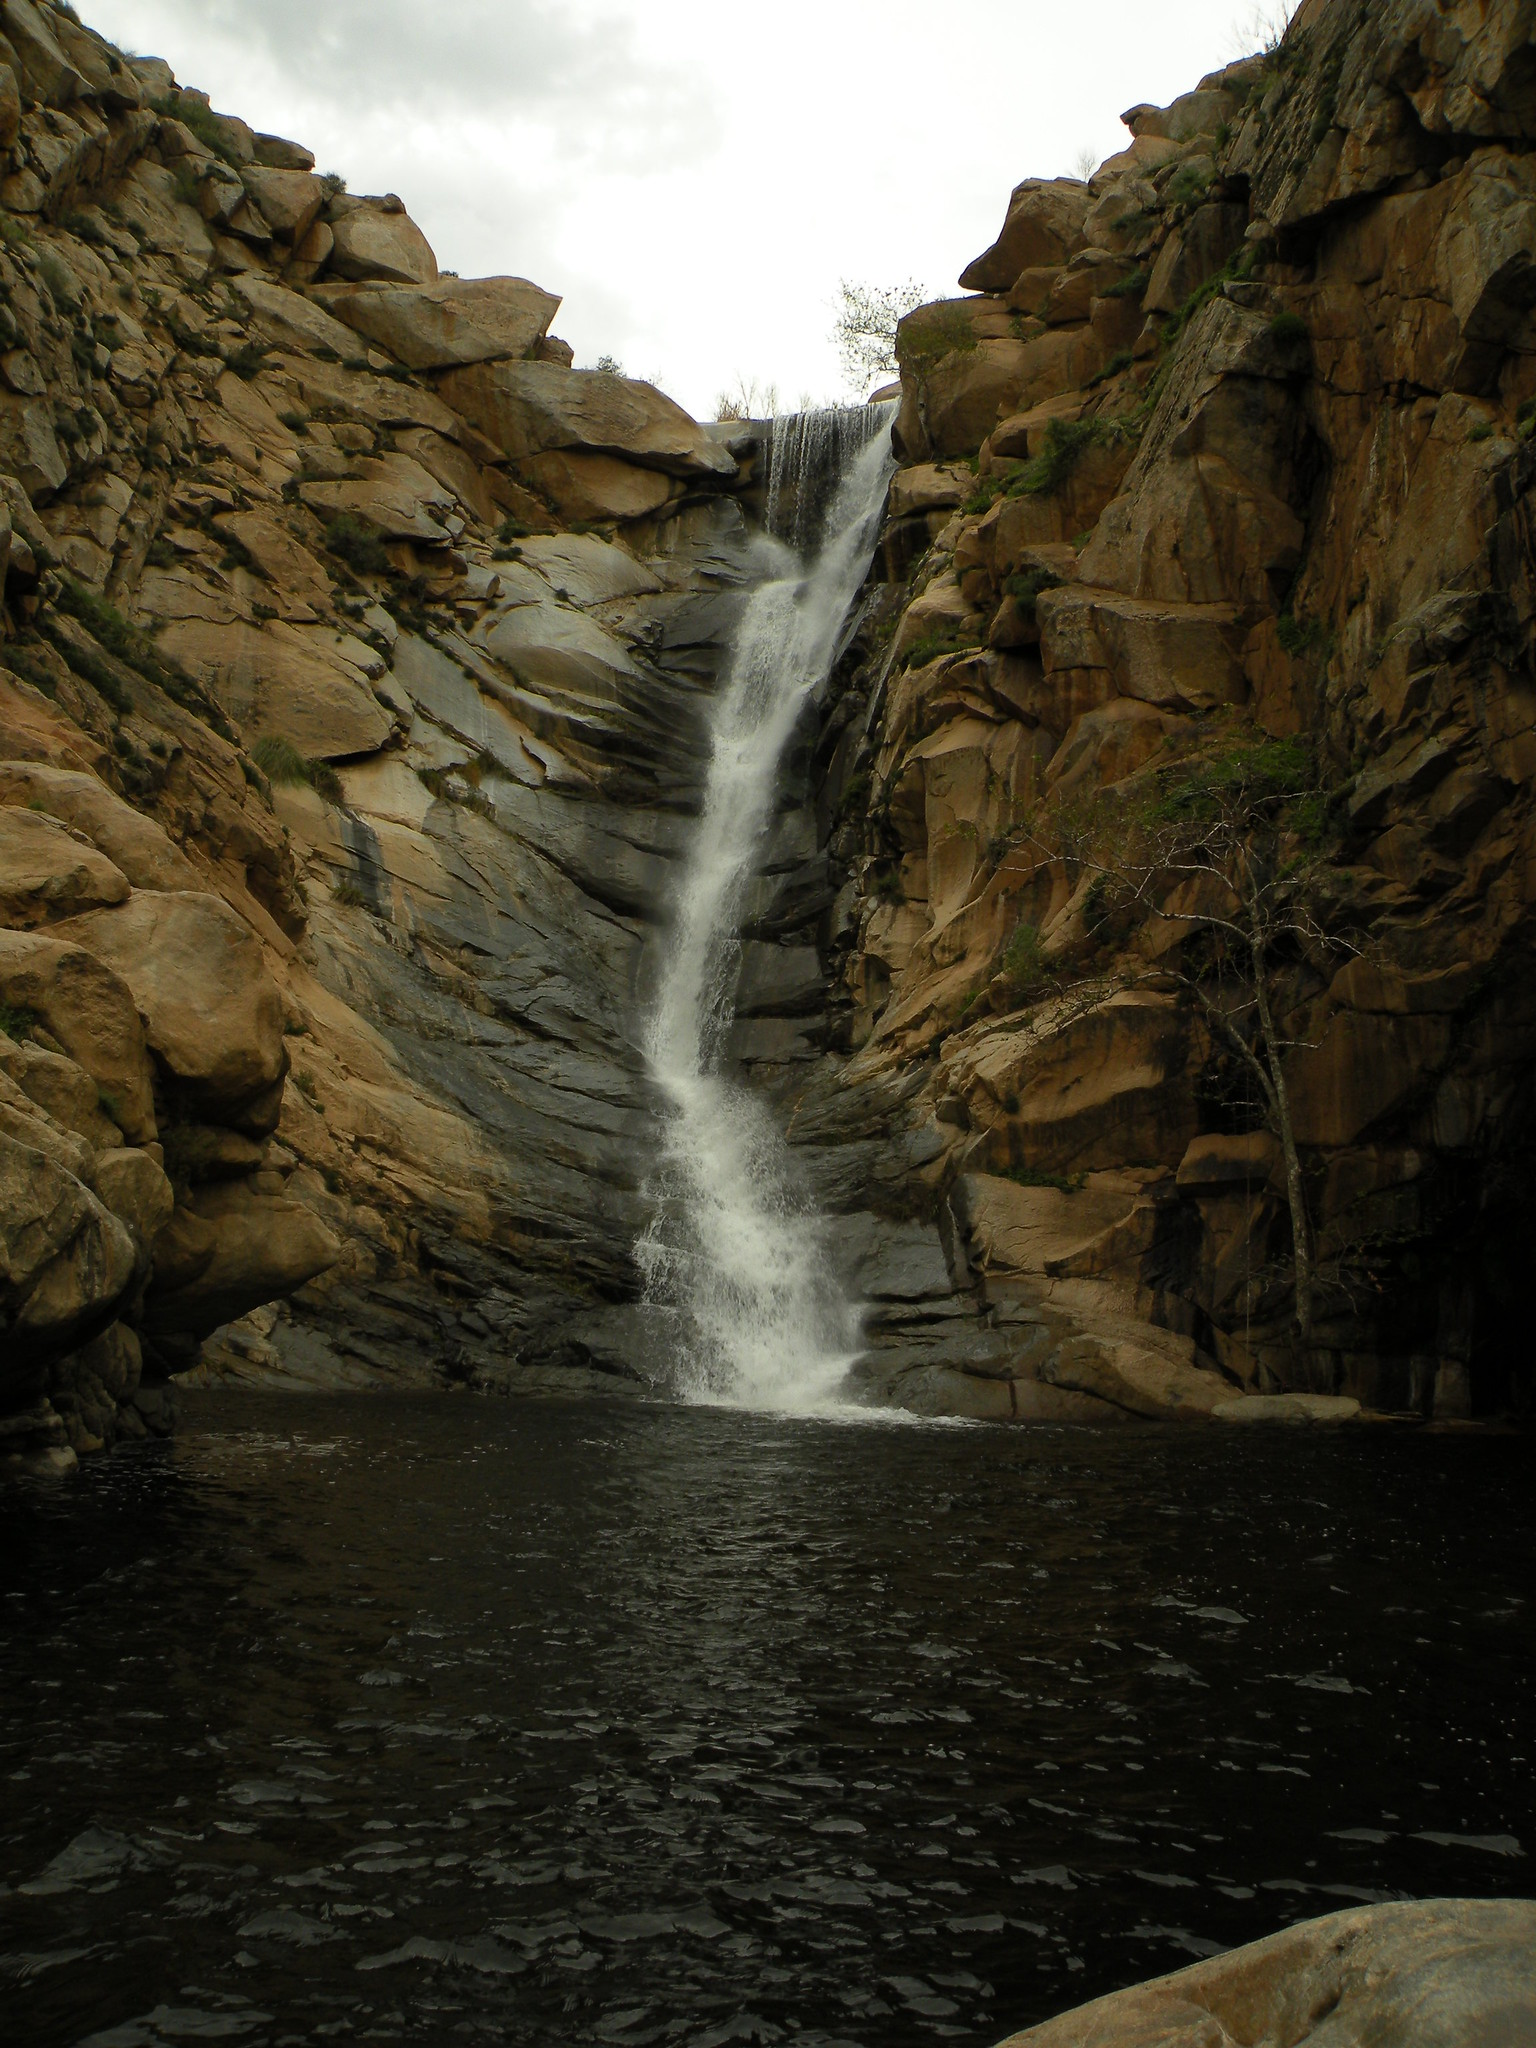 Impressive Waterfall In California-Cedar Creek